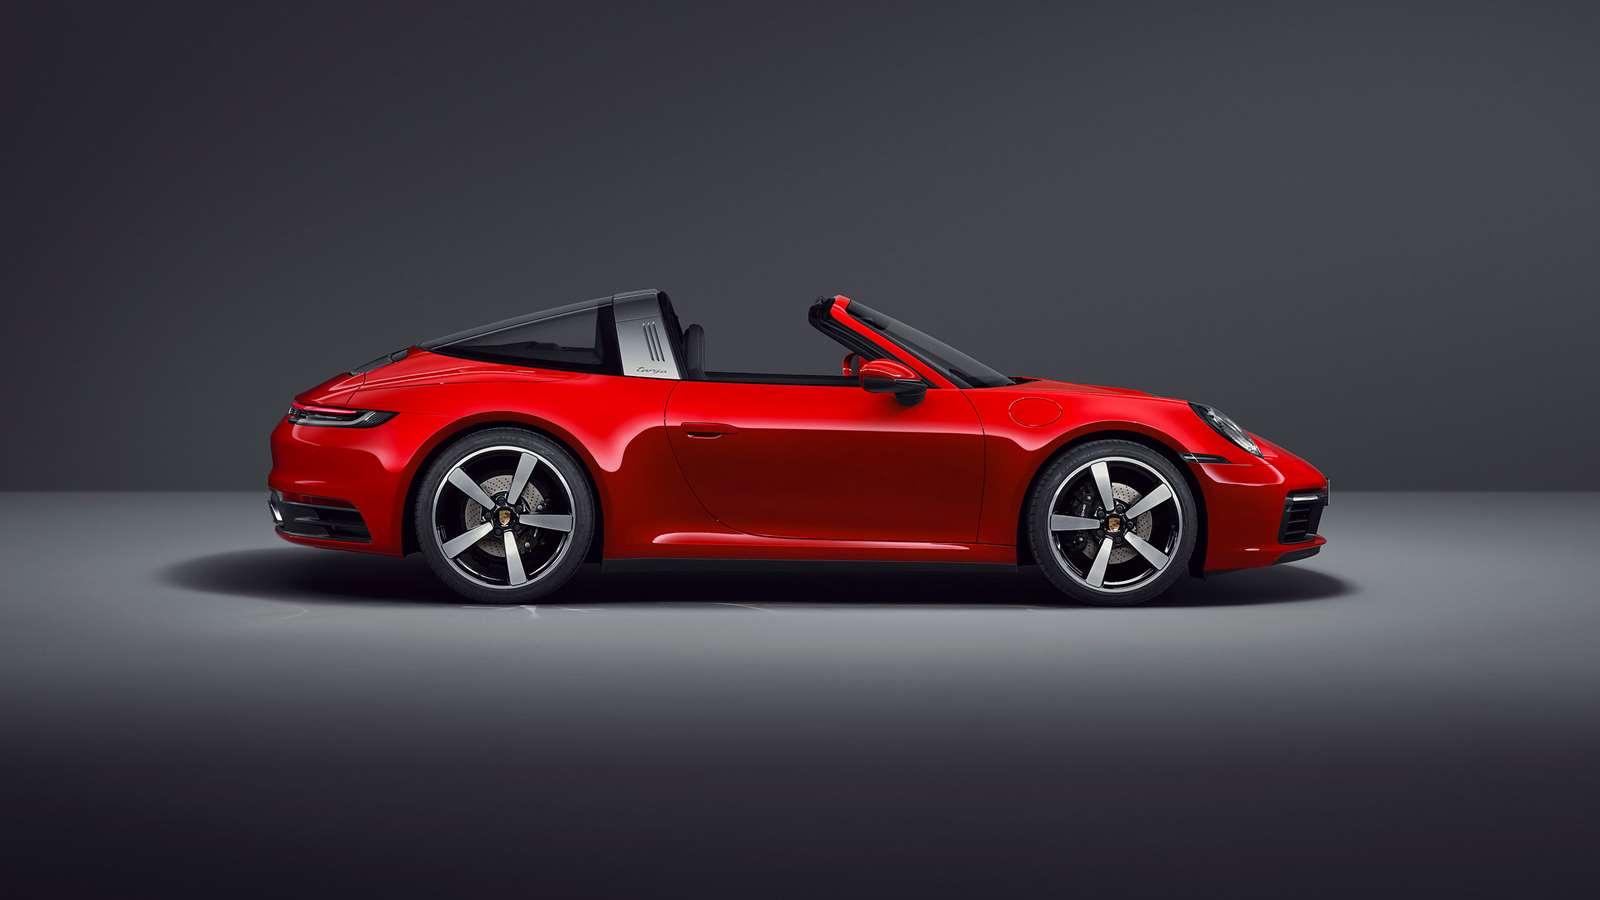 Porsche Reveals New 992 911 Targa Grr